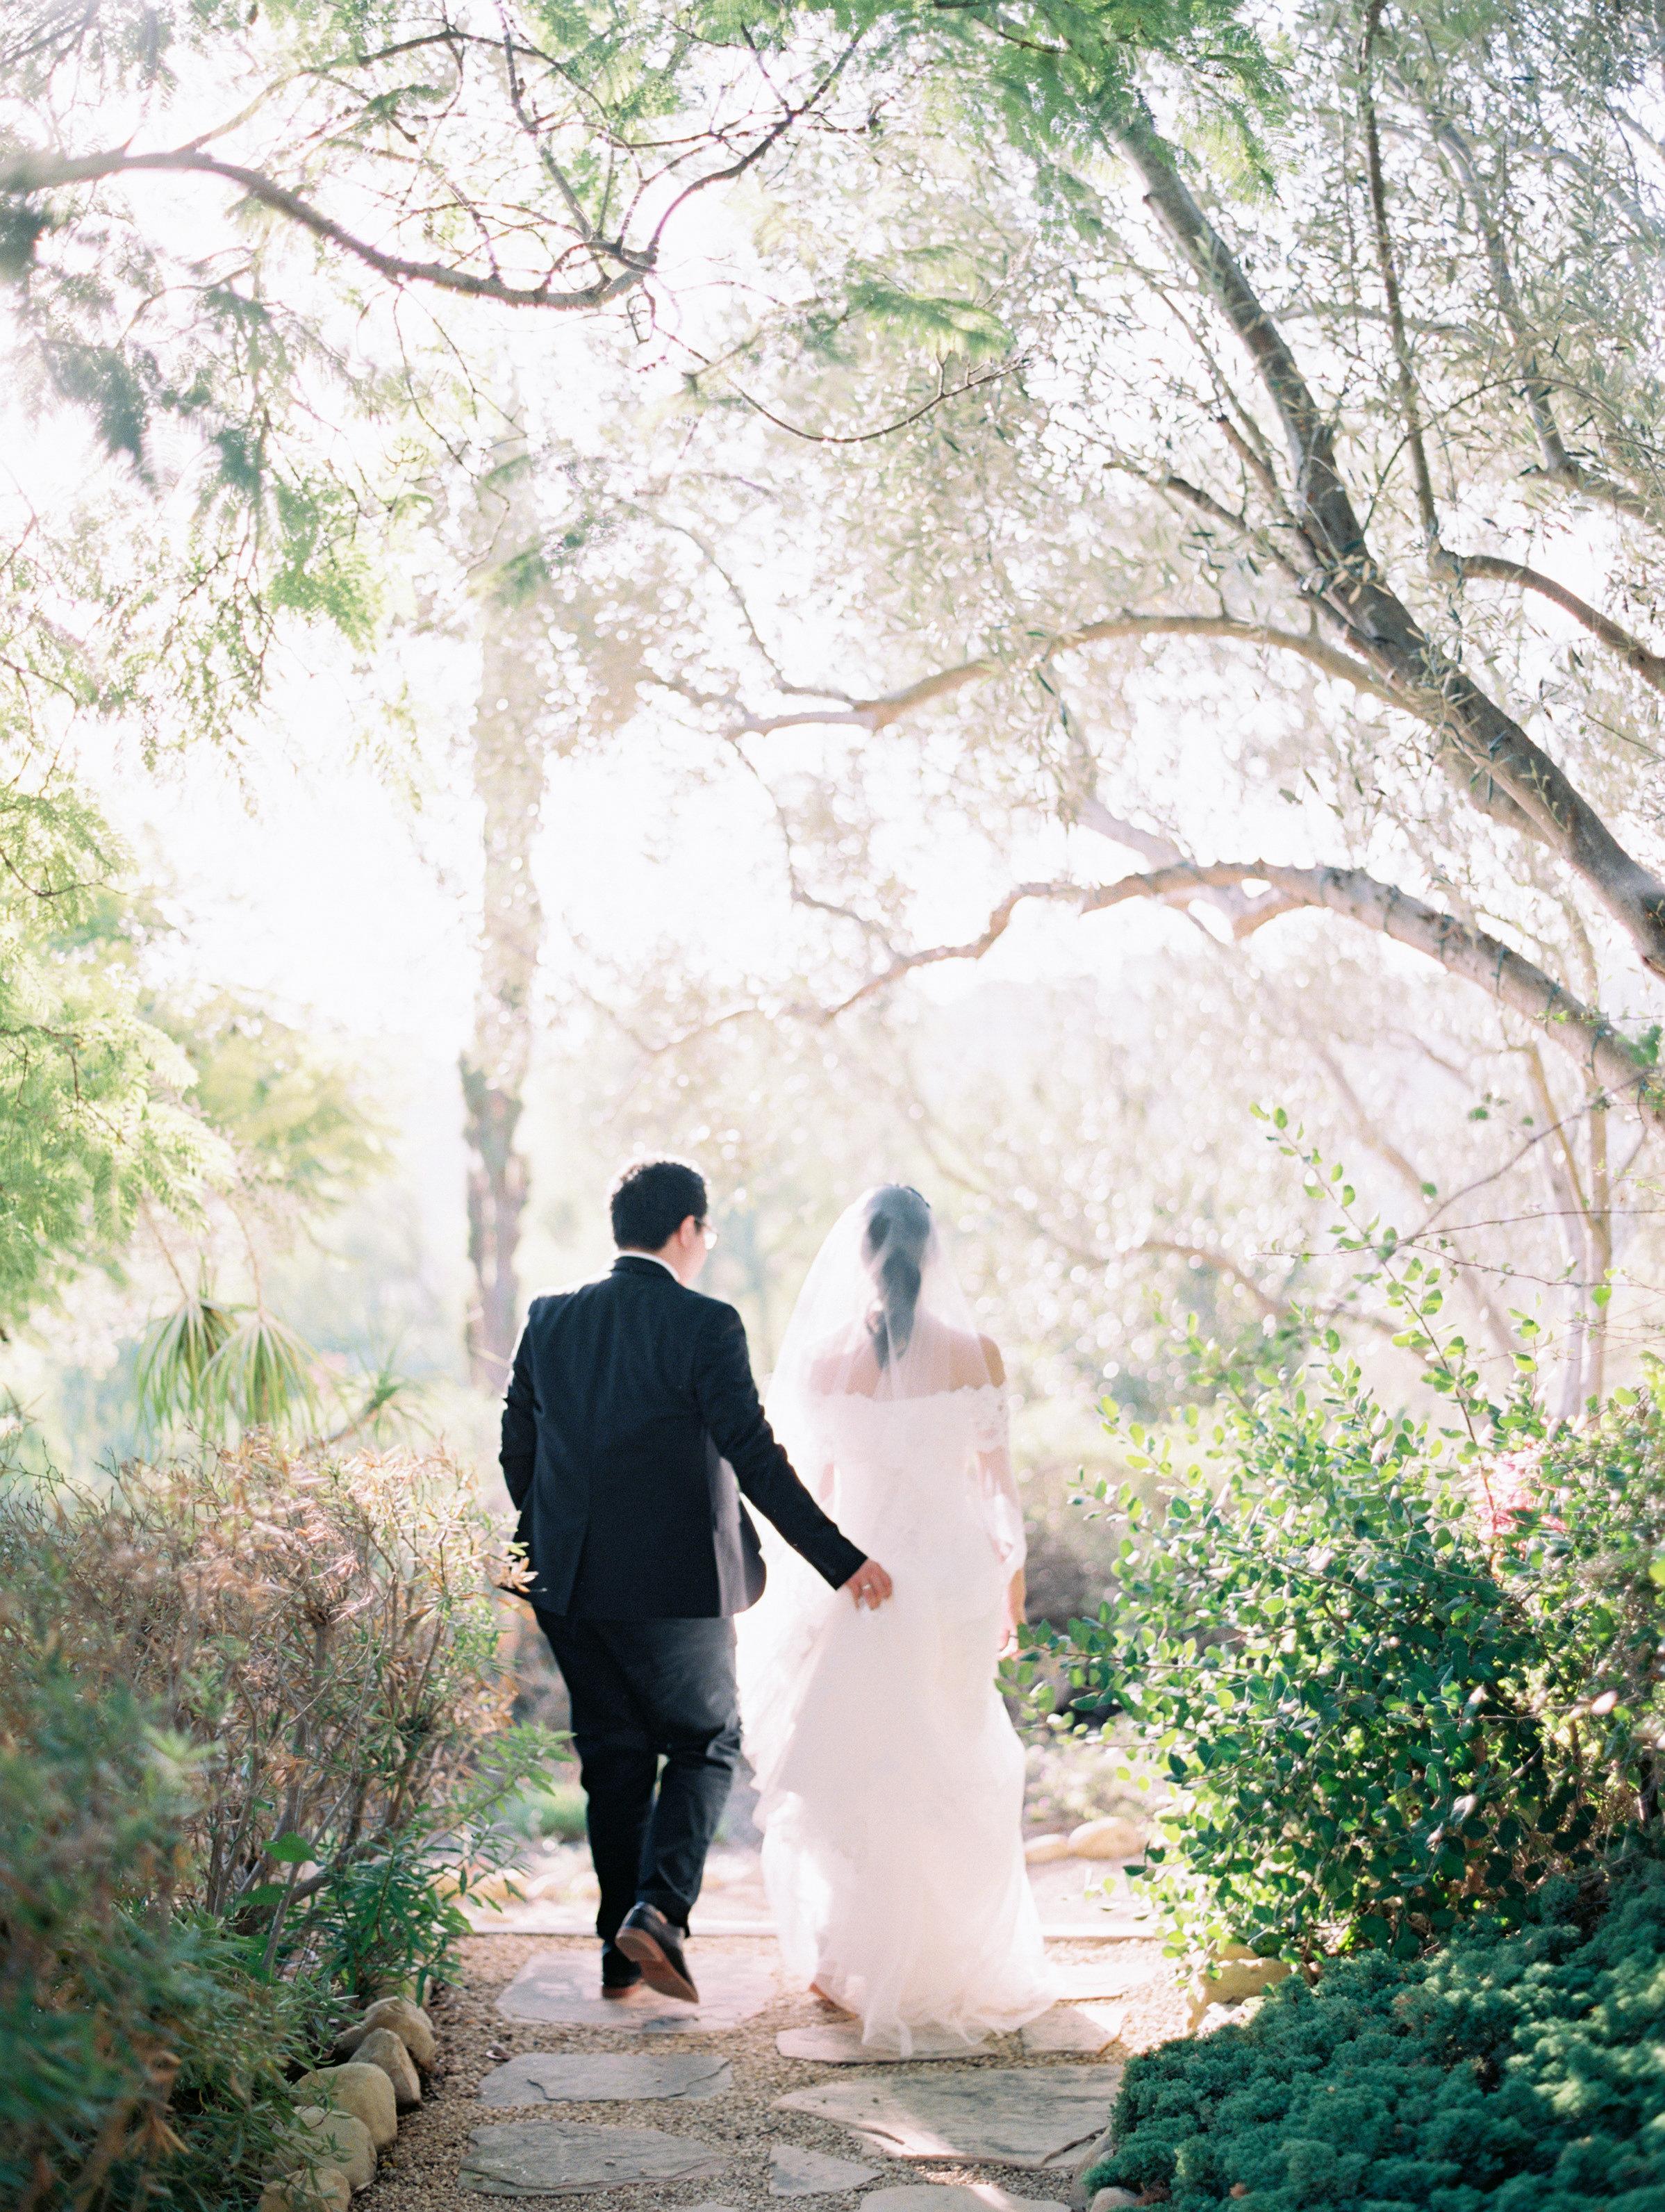 santa-barbara-elopement-wedding-planner-planning-coordinator-coordination-event-design-villa-verano-estate-riviera-garden-olive-tree-asian-day-of-palm-tree (1).jpg